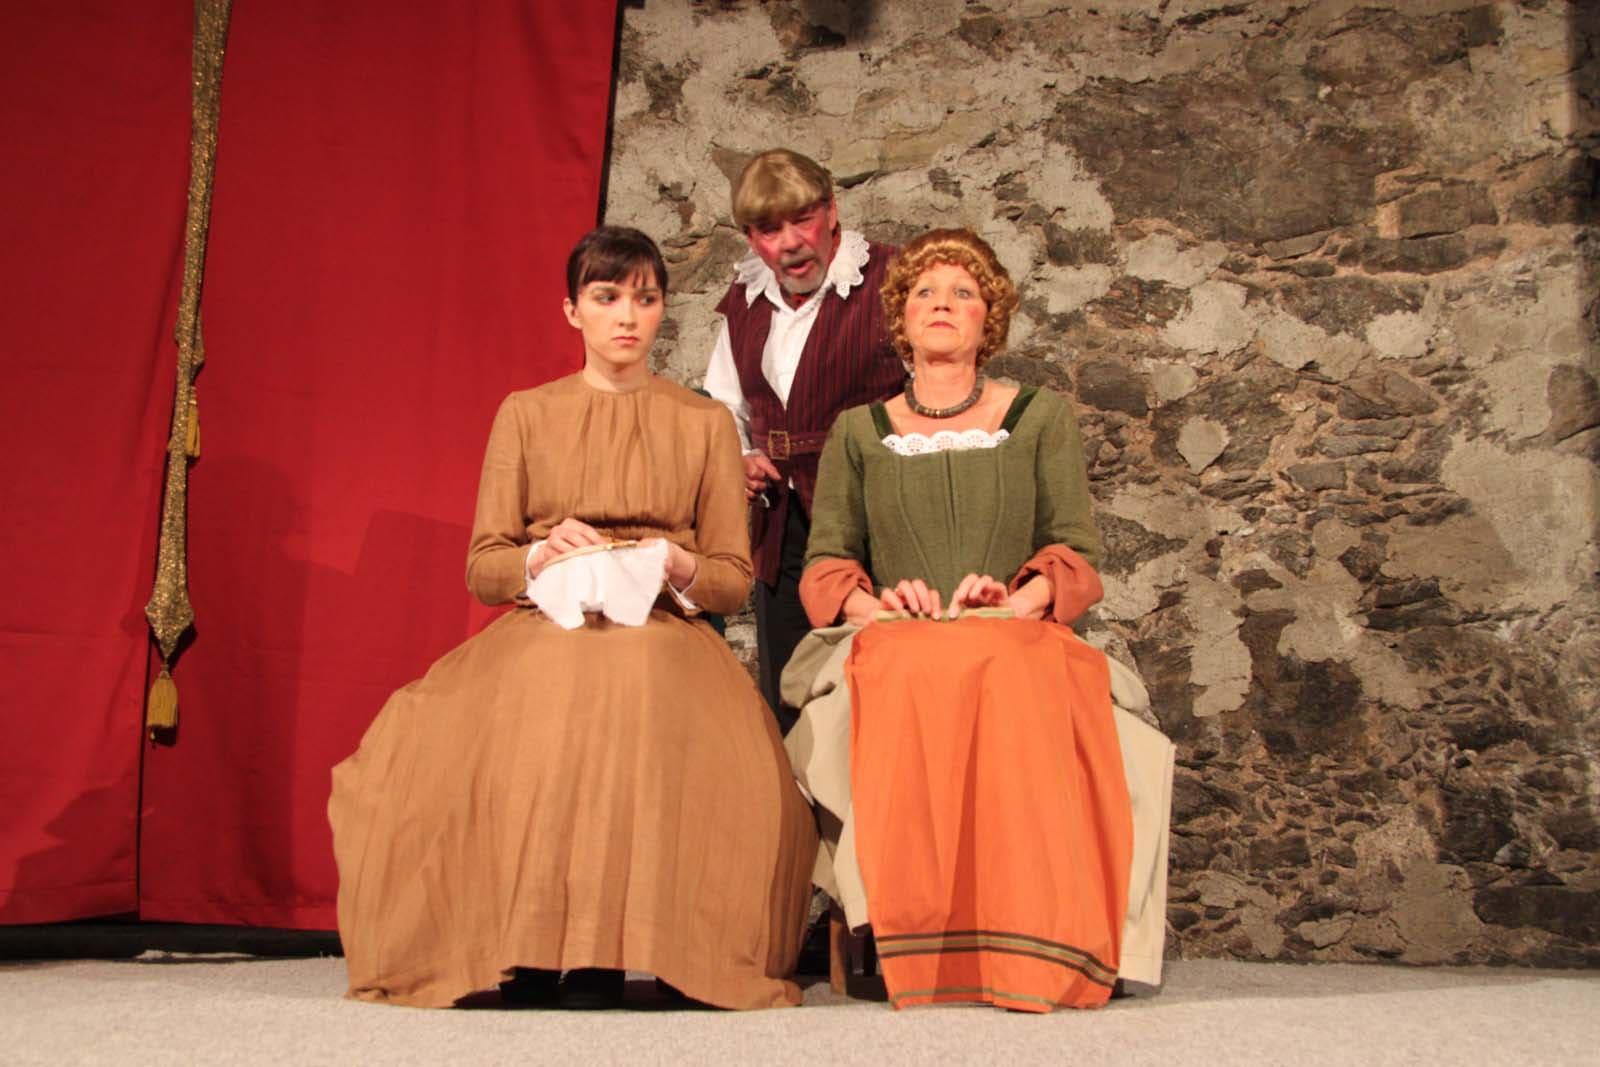 Theater am Land